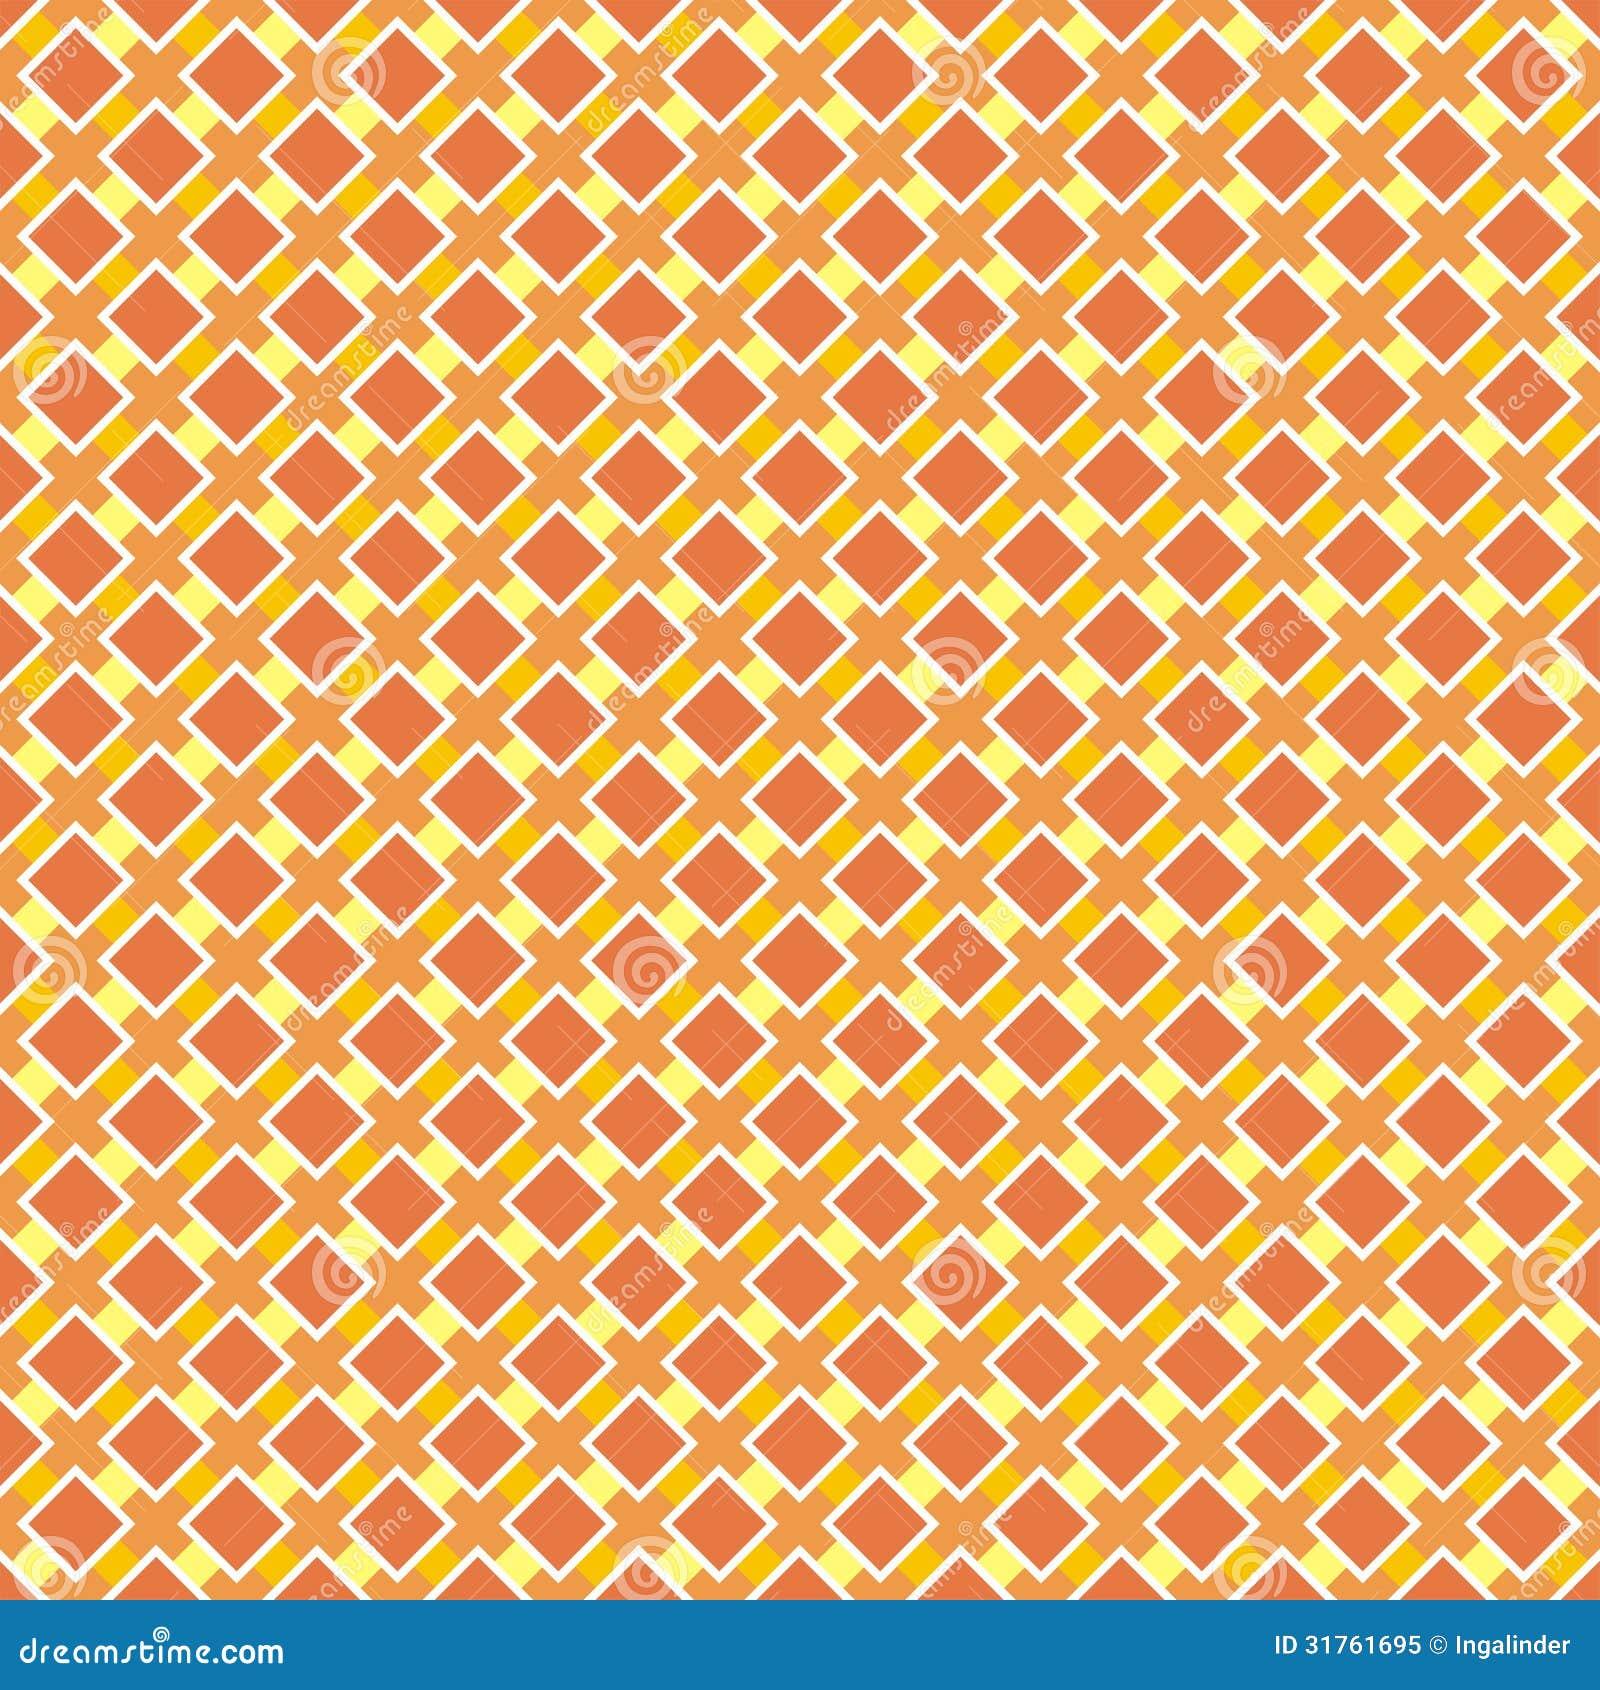 Seamless Vector Retro Summer Or Autumn Pattern Royalty Free Stock Photo